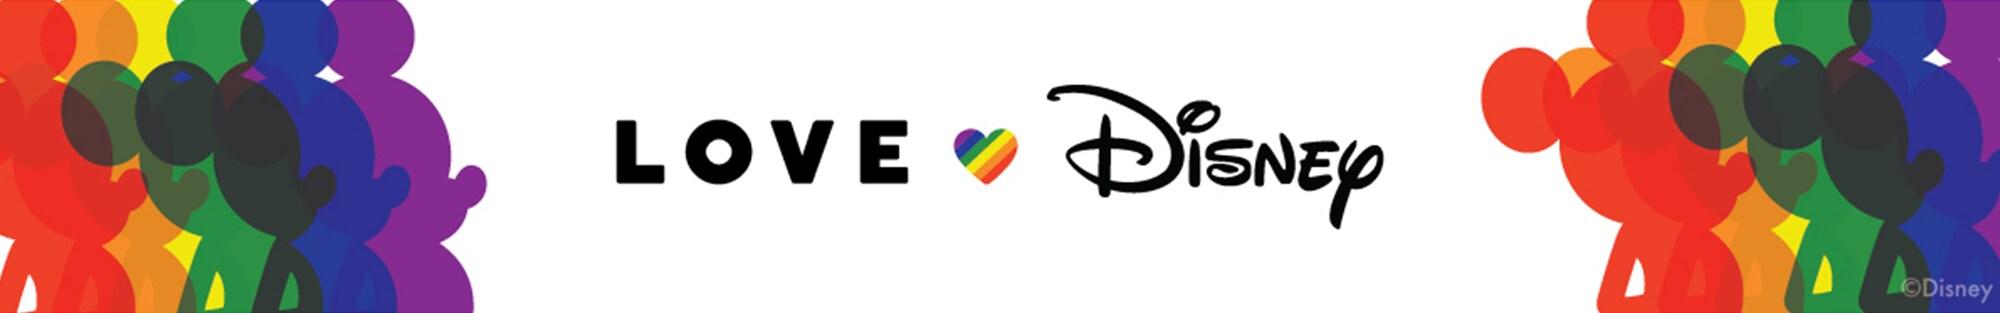 Mid_ShopDisney_Disney_Jul20_MX_Pride (Int)